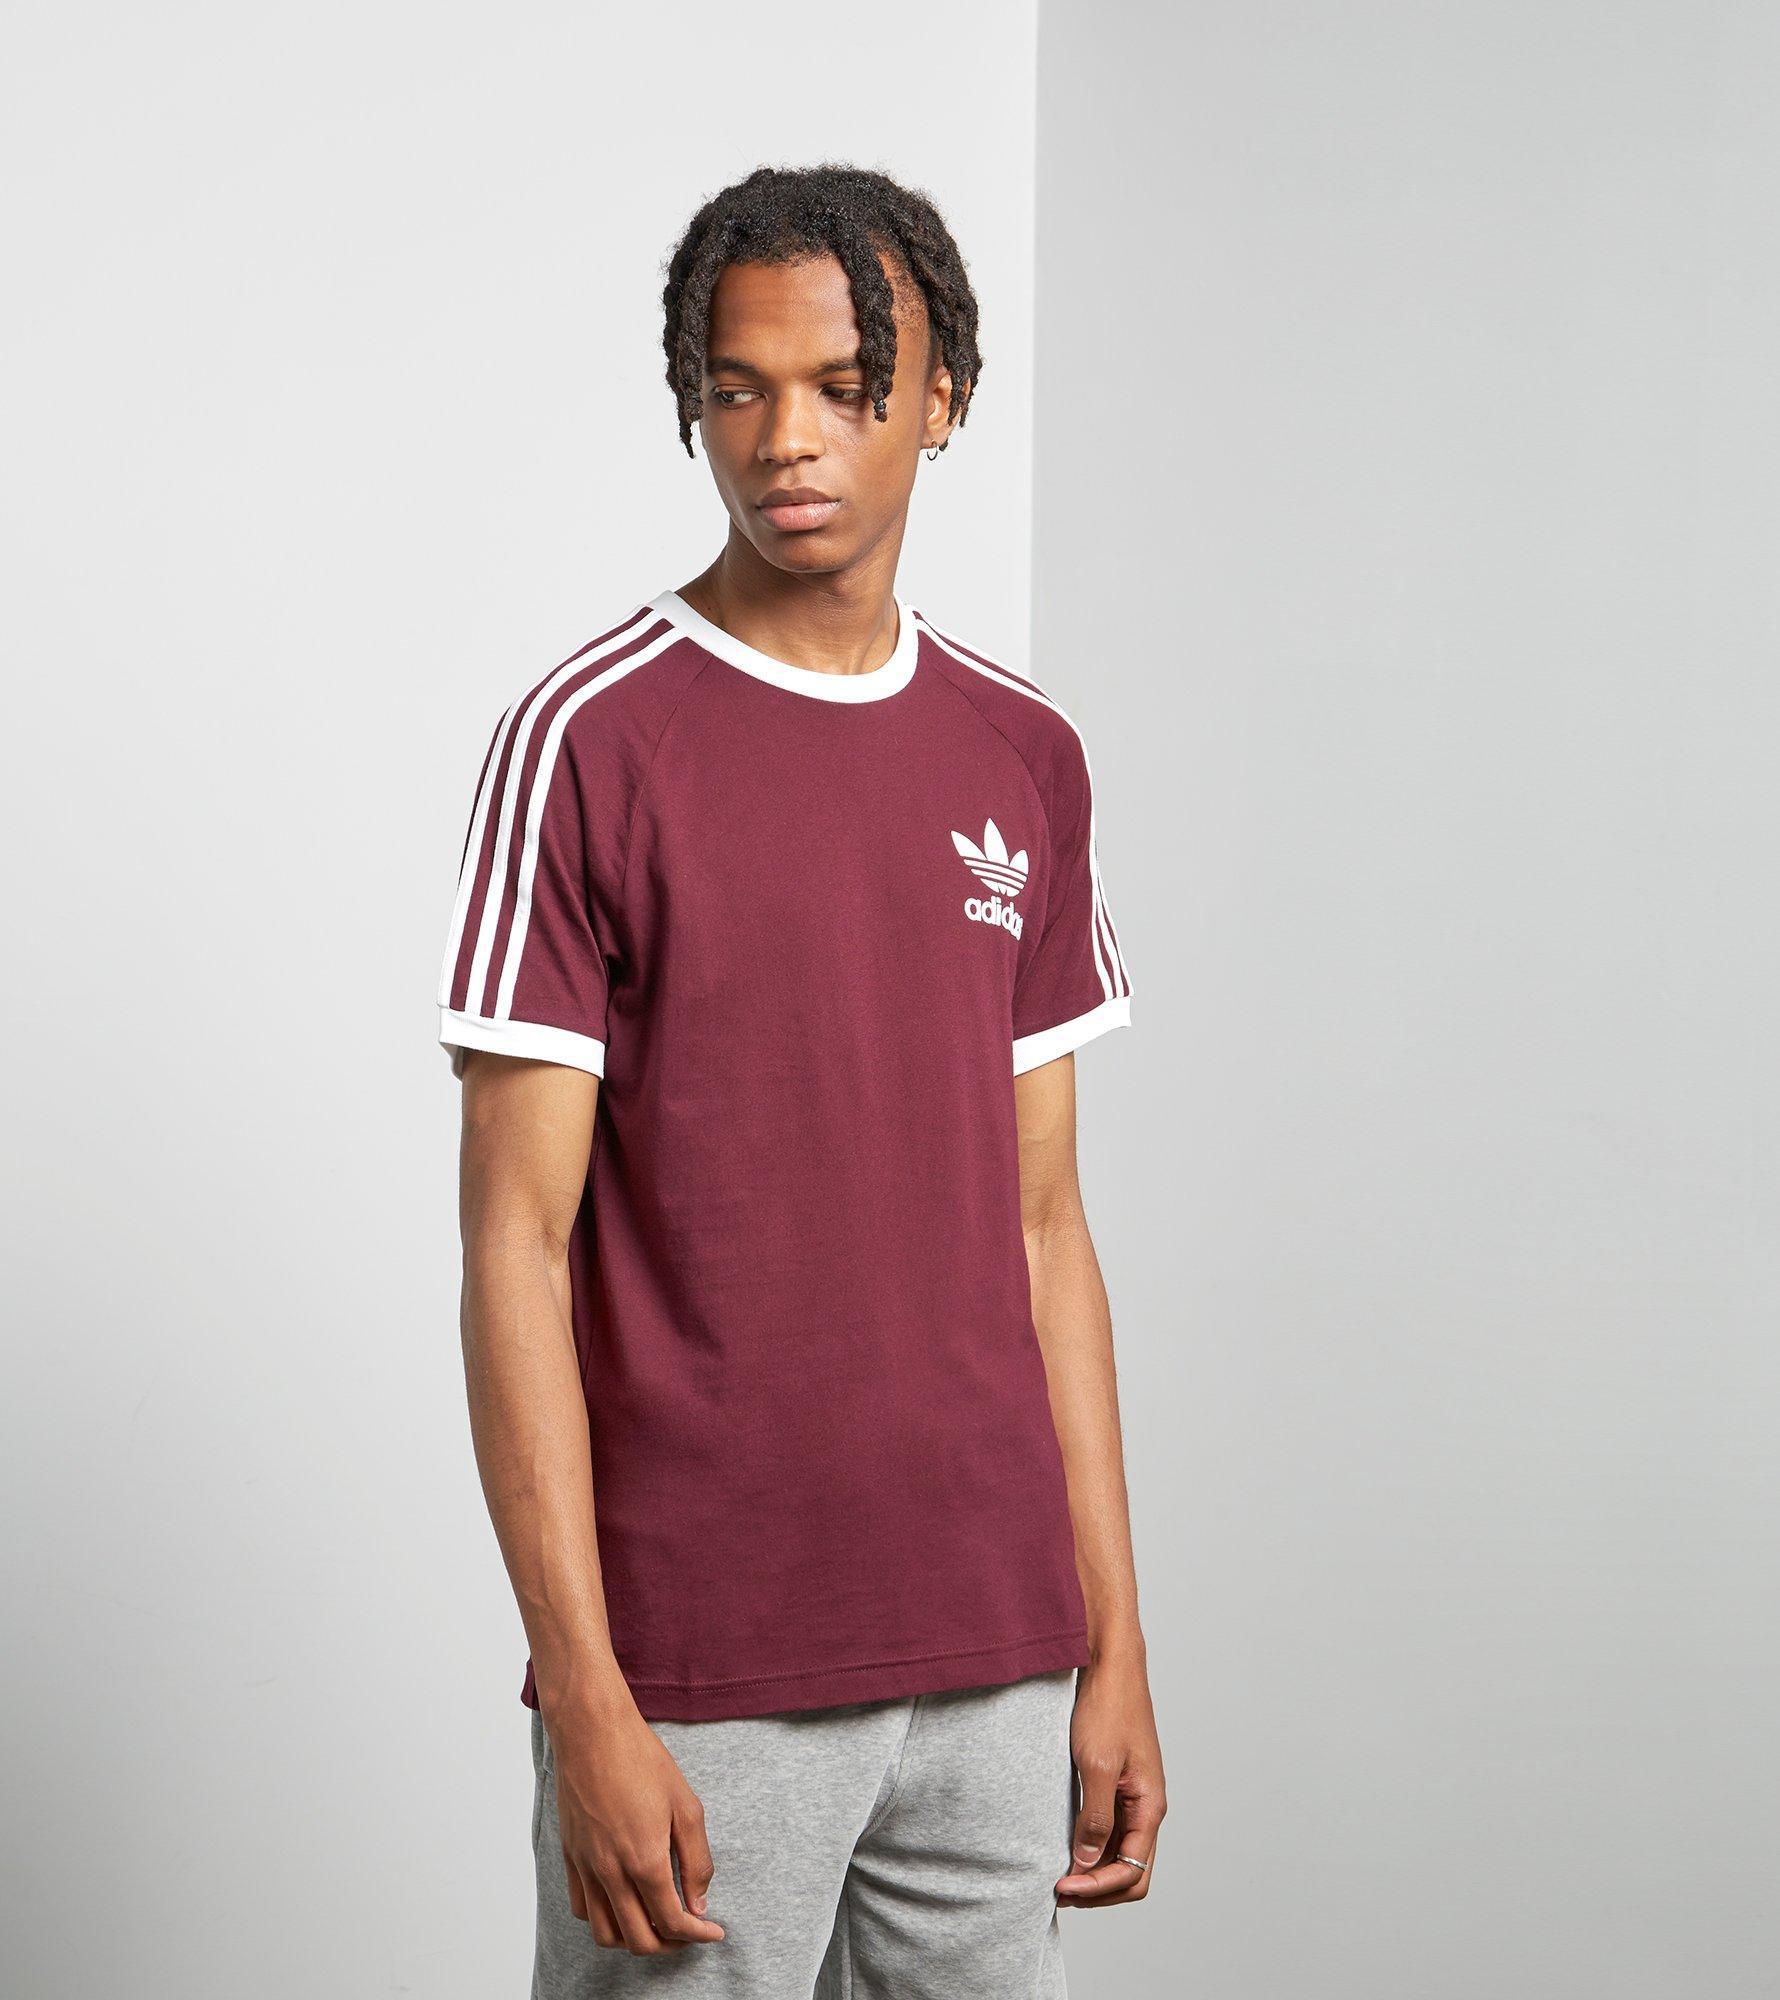 7b58ee3890c Adidas Originals California Short Sleeve T-shirt in Red for Men - Lyst